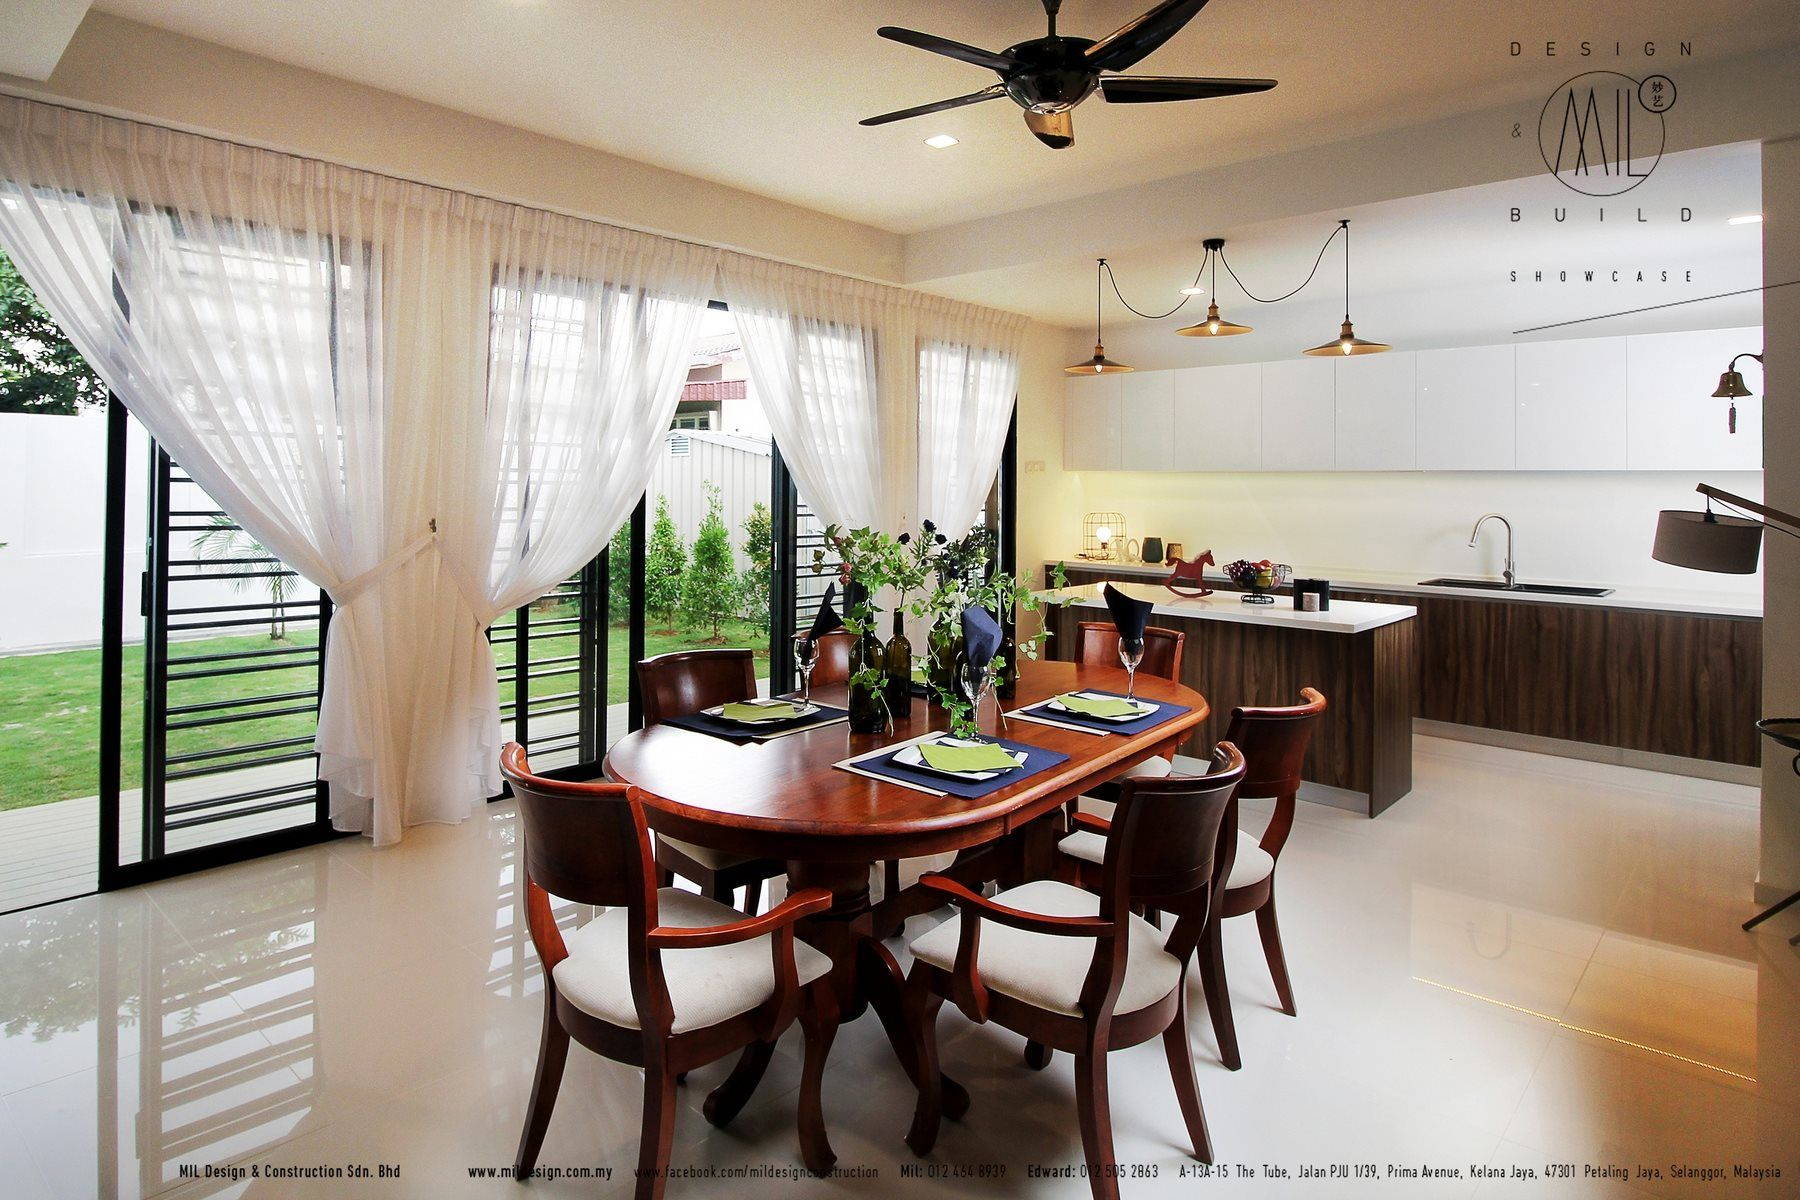 RENOF Home Renovation Malaysia Interior Design